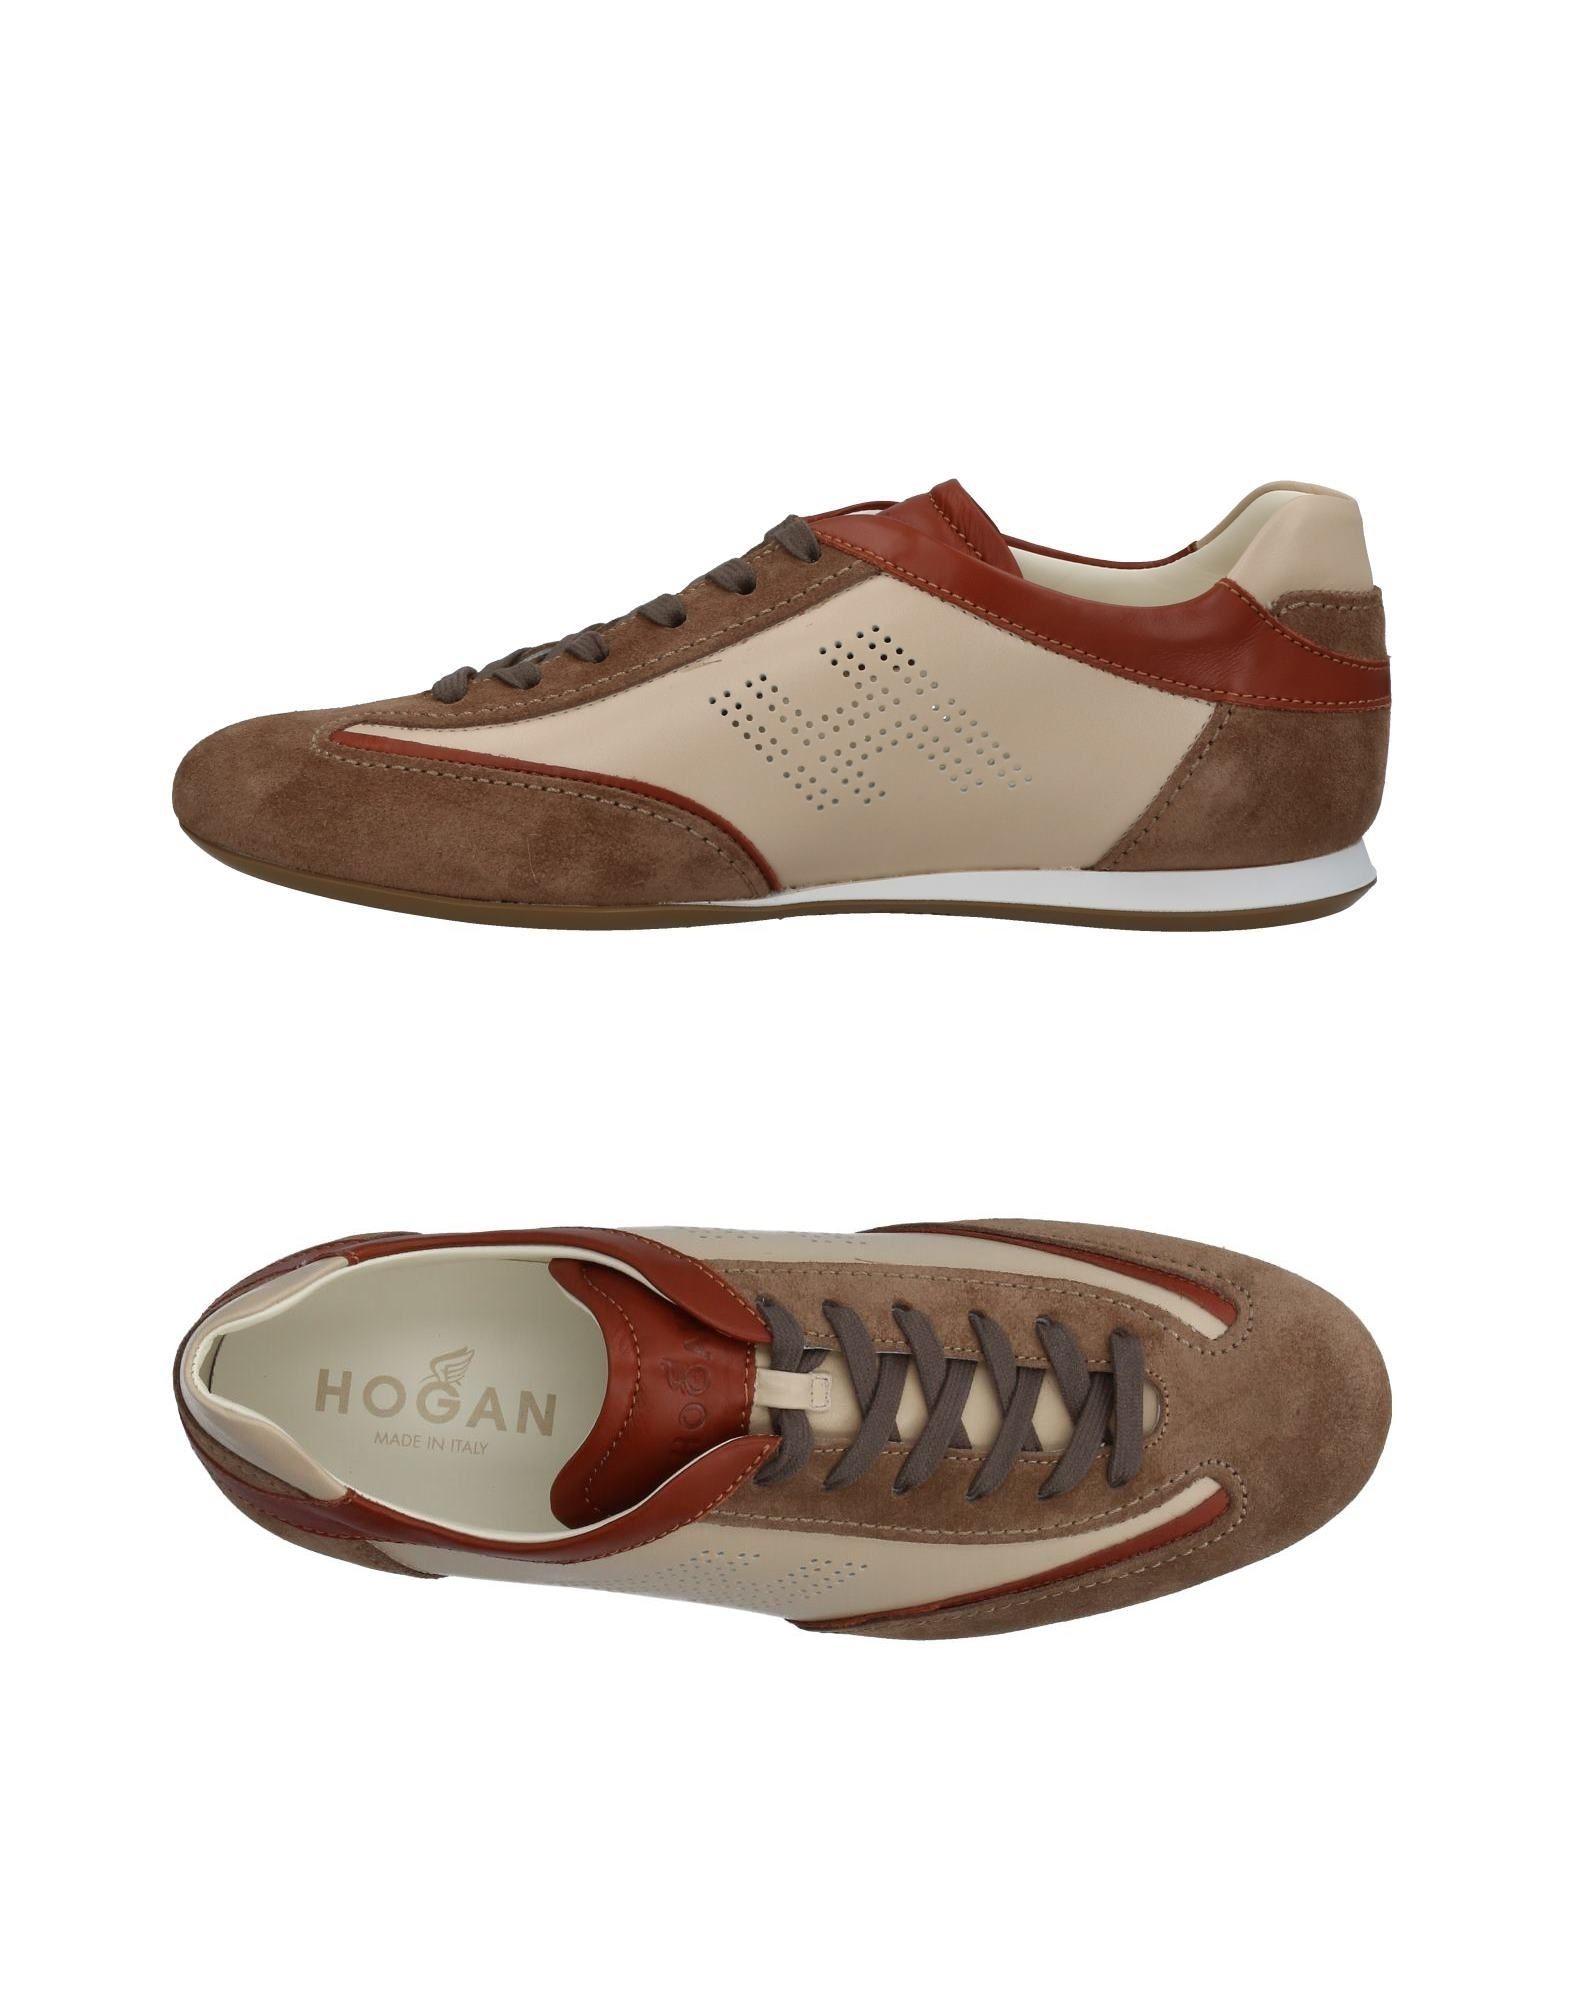 Hogan Sneakers Herren  11396874CL Gute Qualität beliebte Schuhe